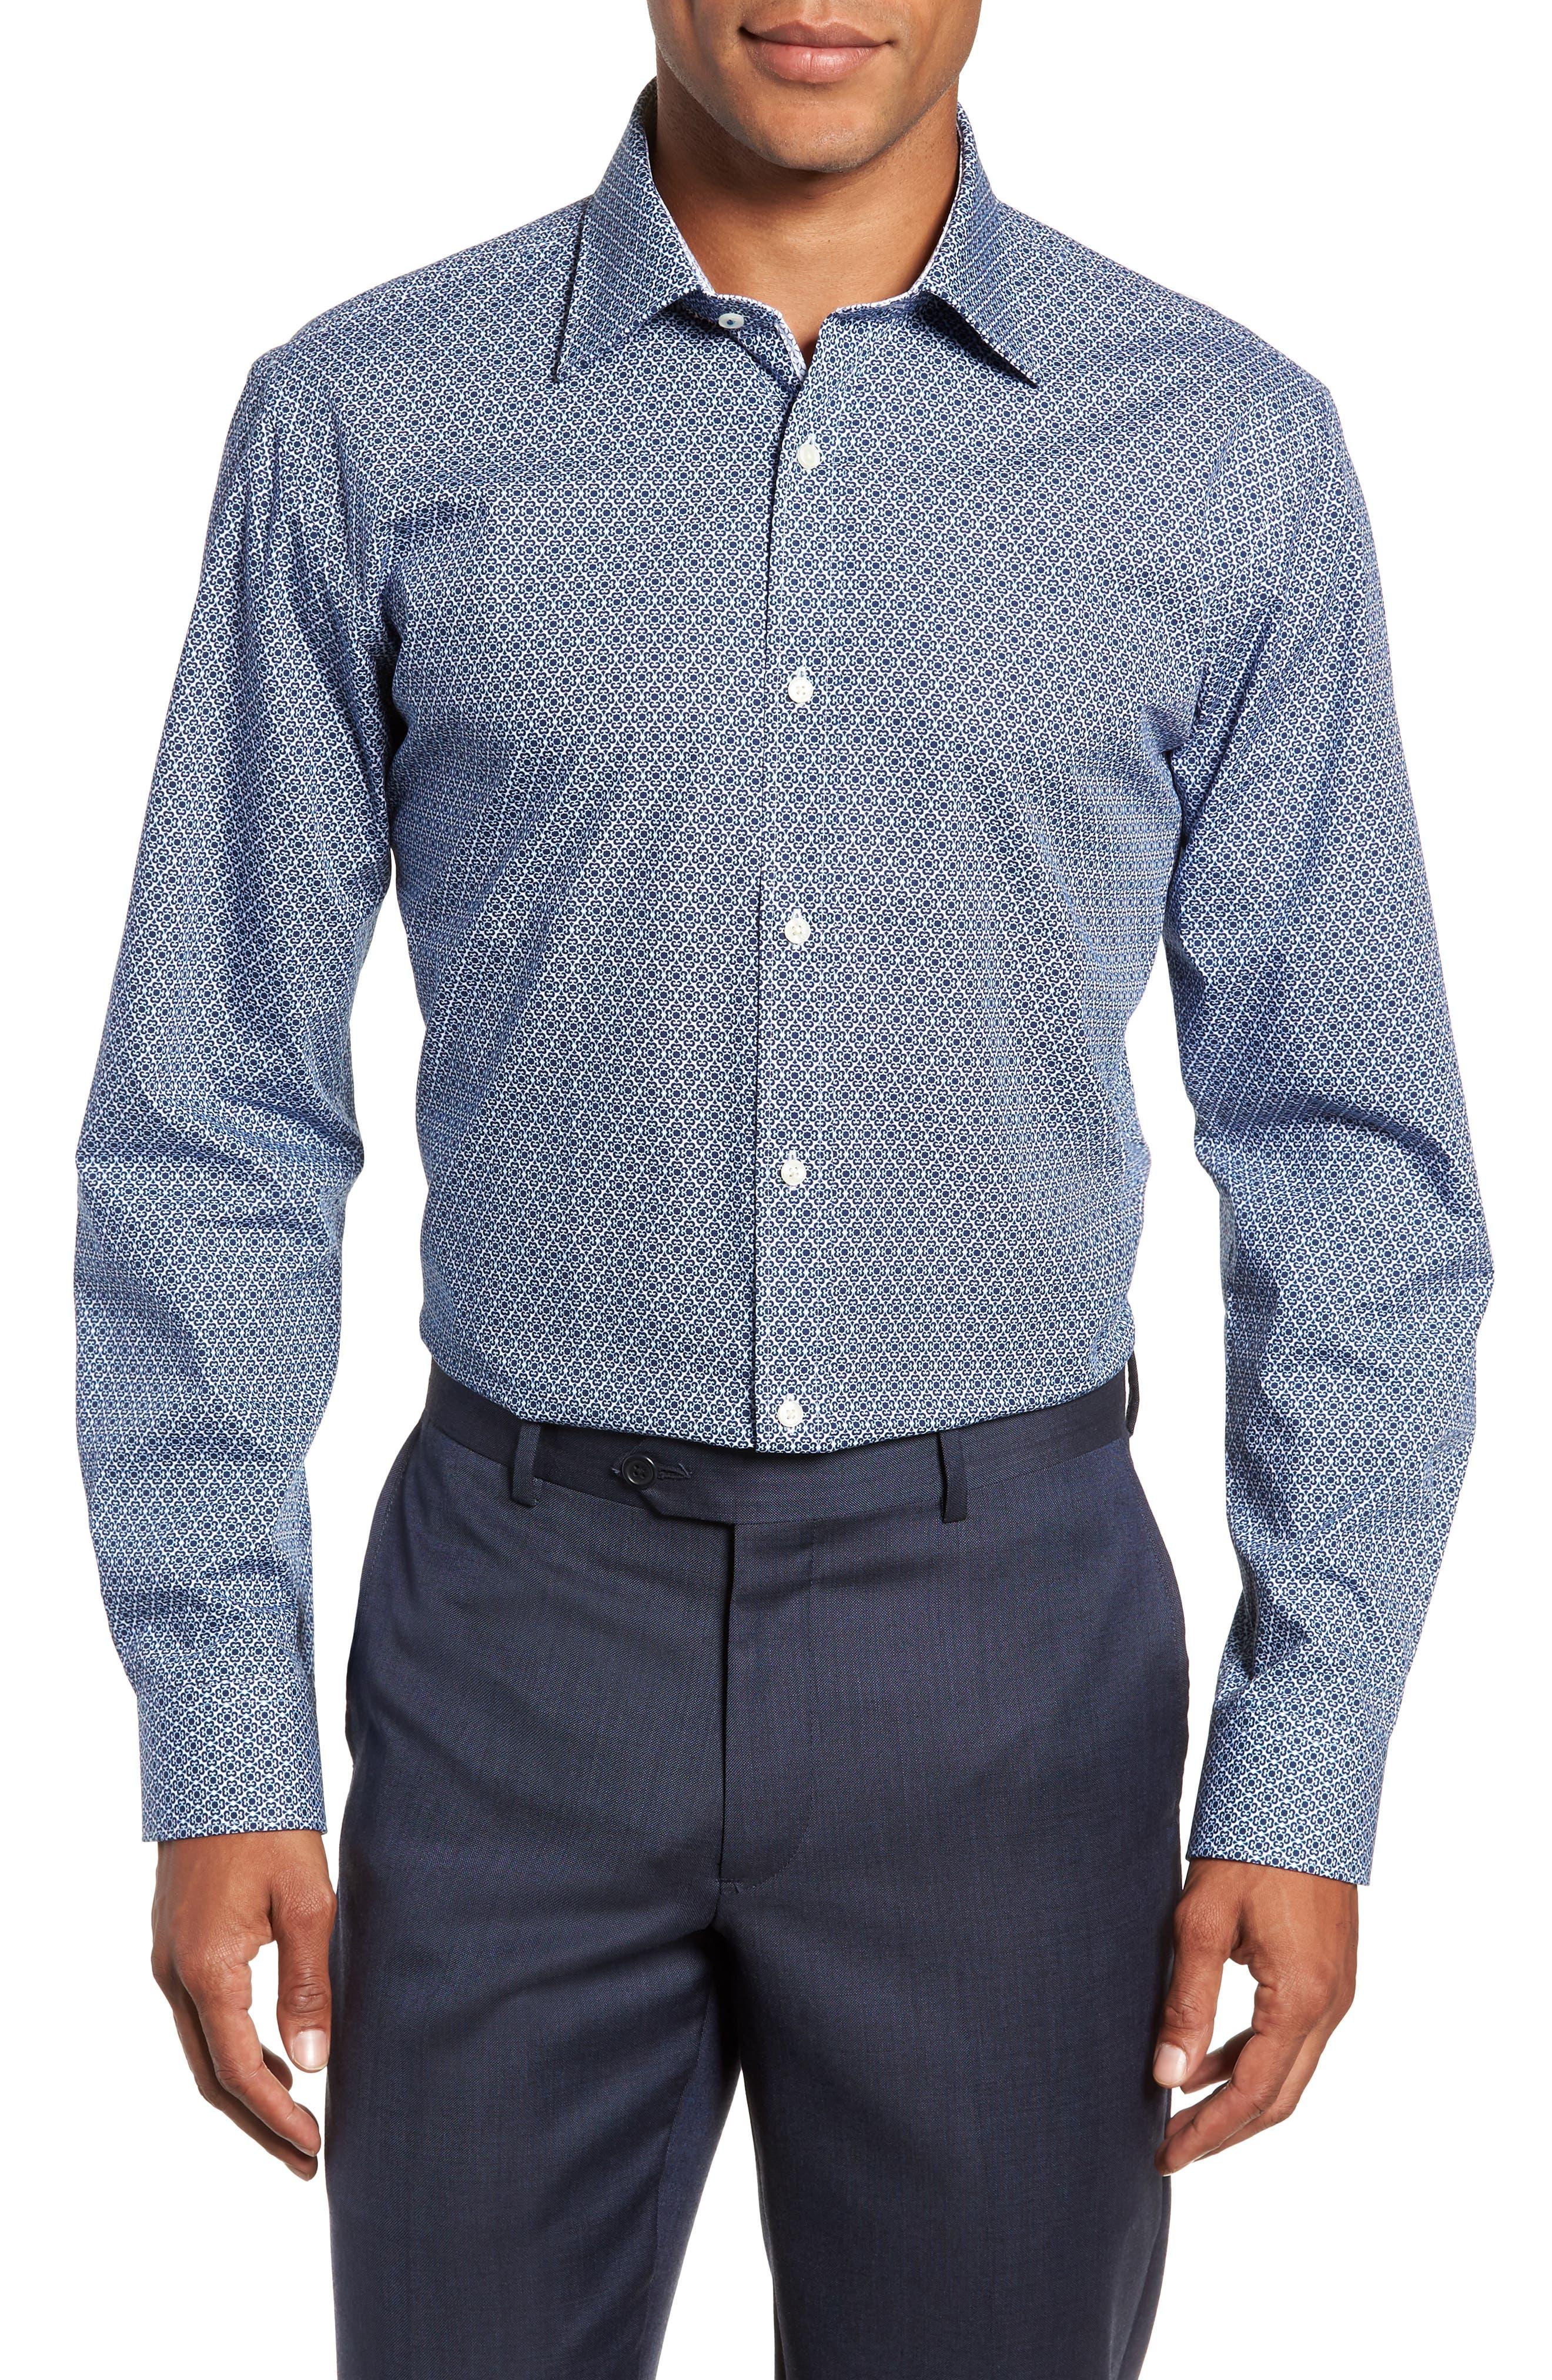 Slestmi Slim Fit Print Dress Shirt,                         Main,                         color, BLUE